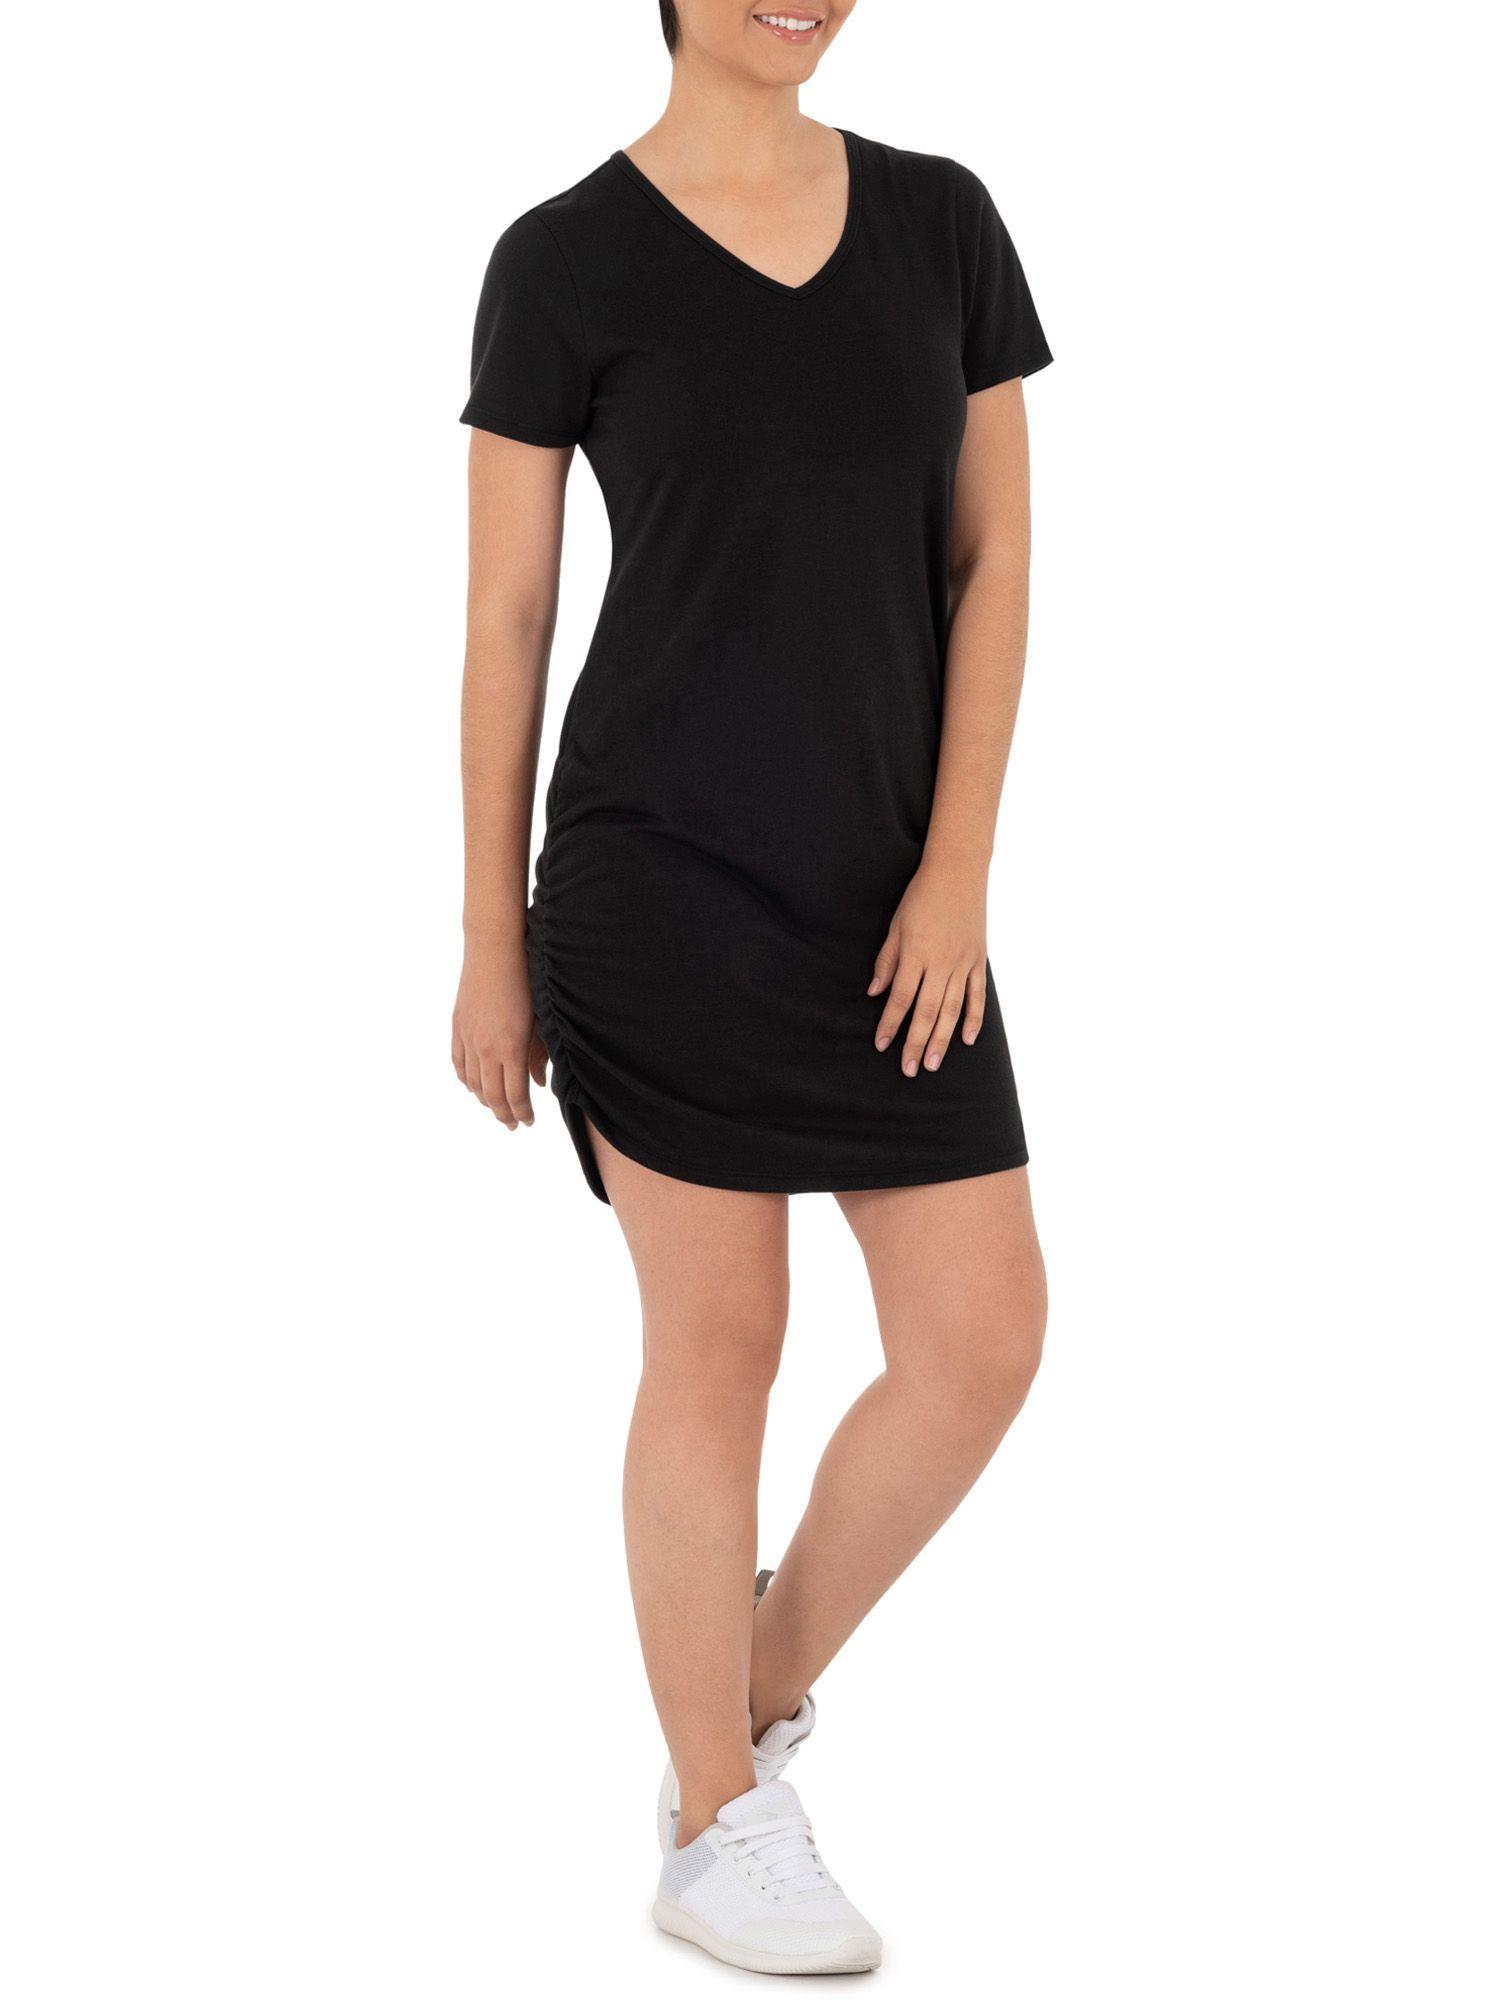 Athletic Works Athletic Works Women S Athleisure Short Sleeve T Shirt Dress Walmart Com Athleisure Women Athleisure Shorts T Shirt Dress [ 2000 x 1500 Pixel ]